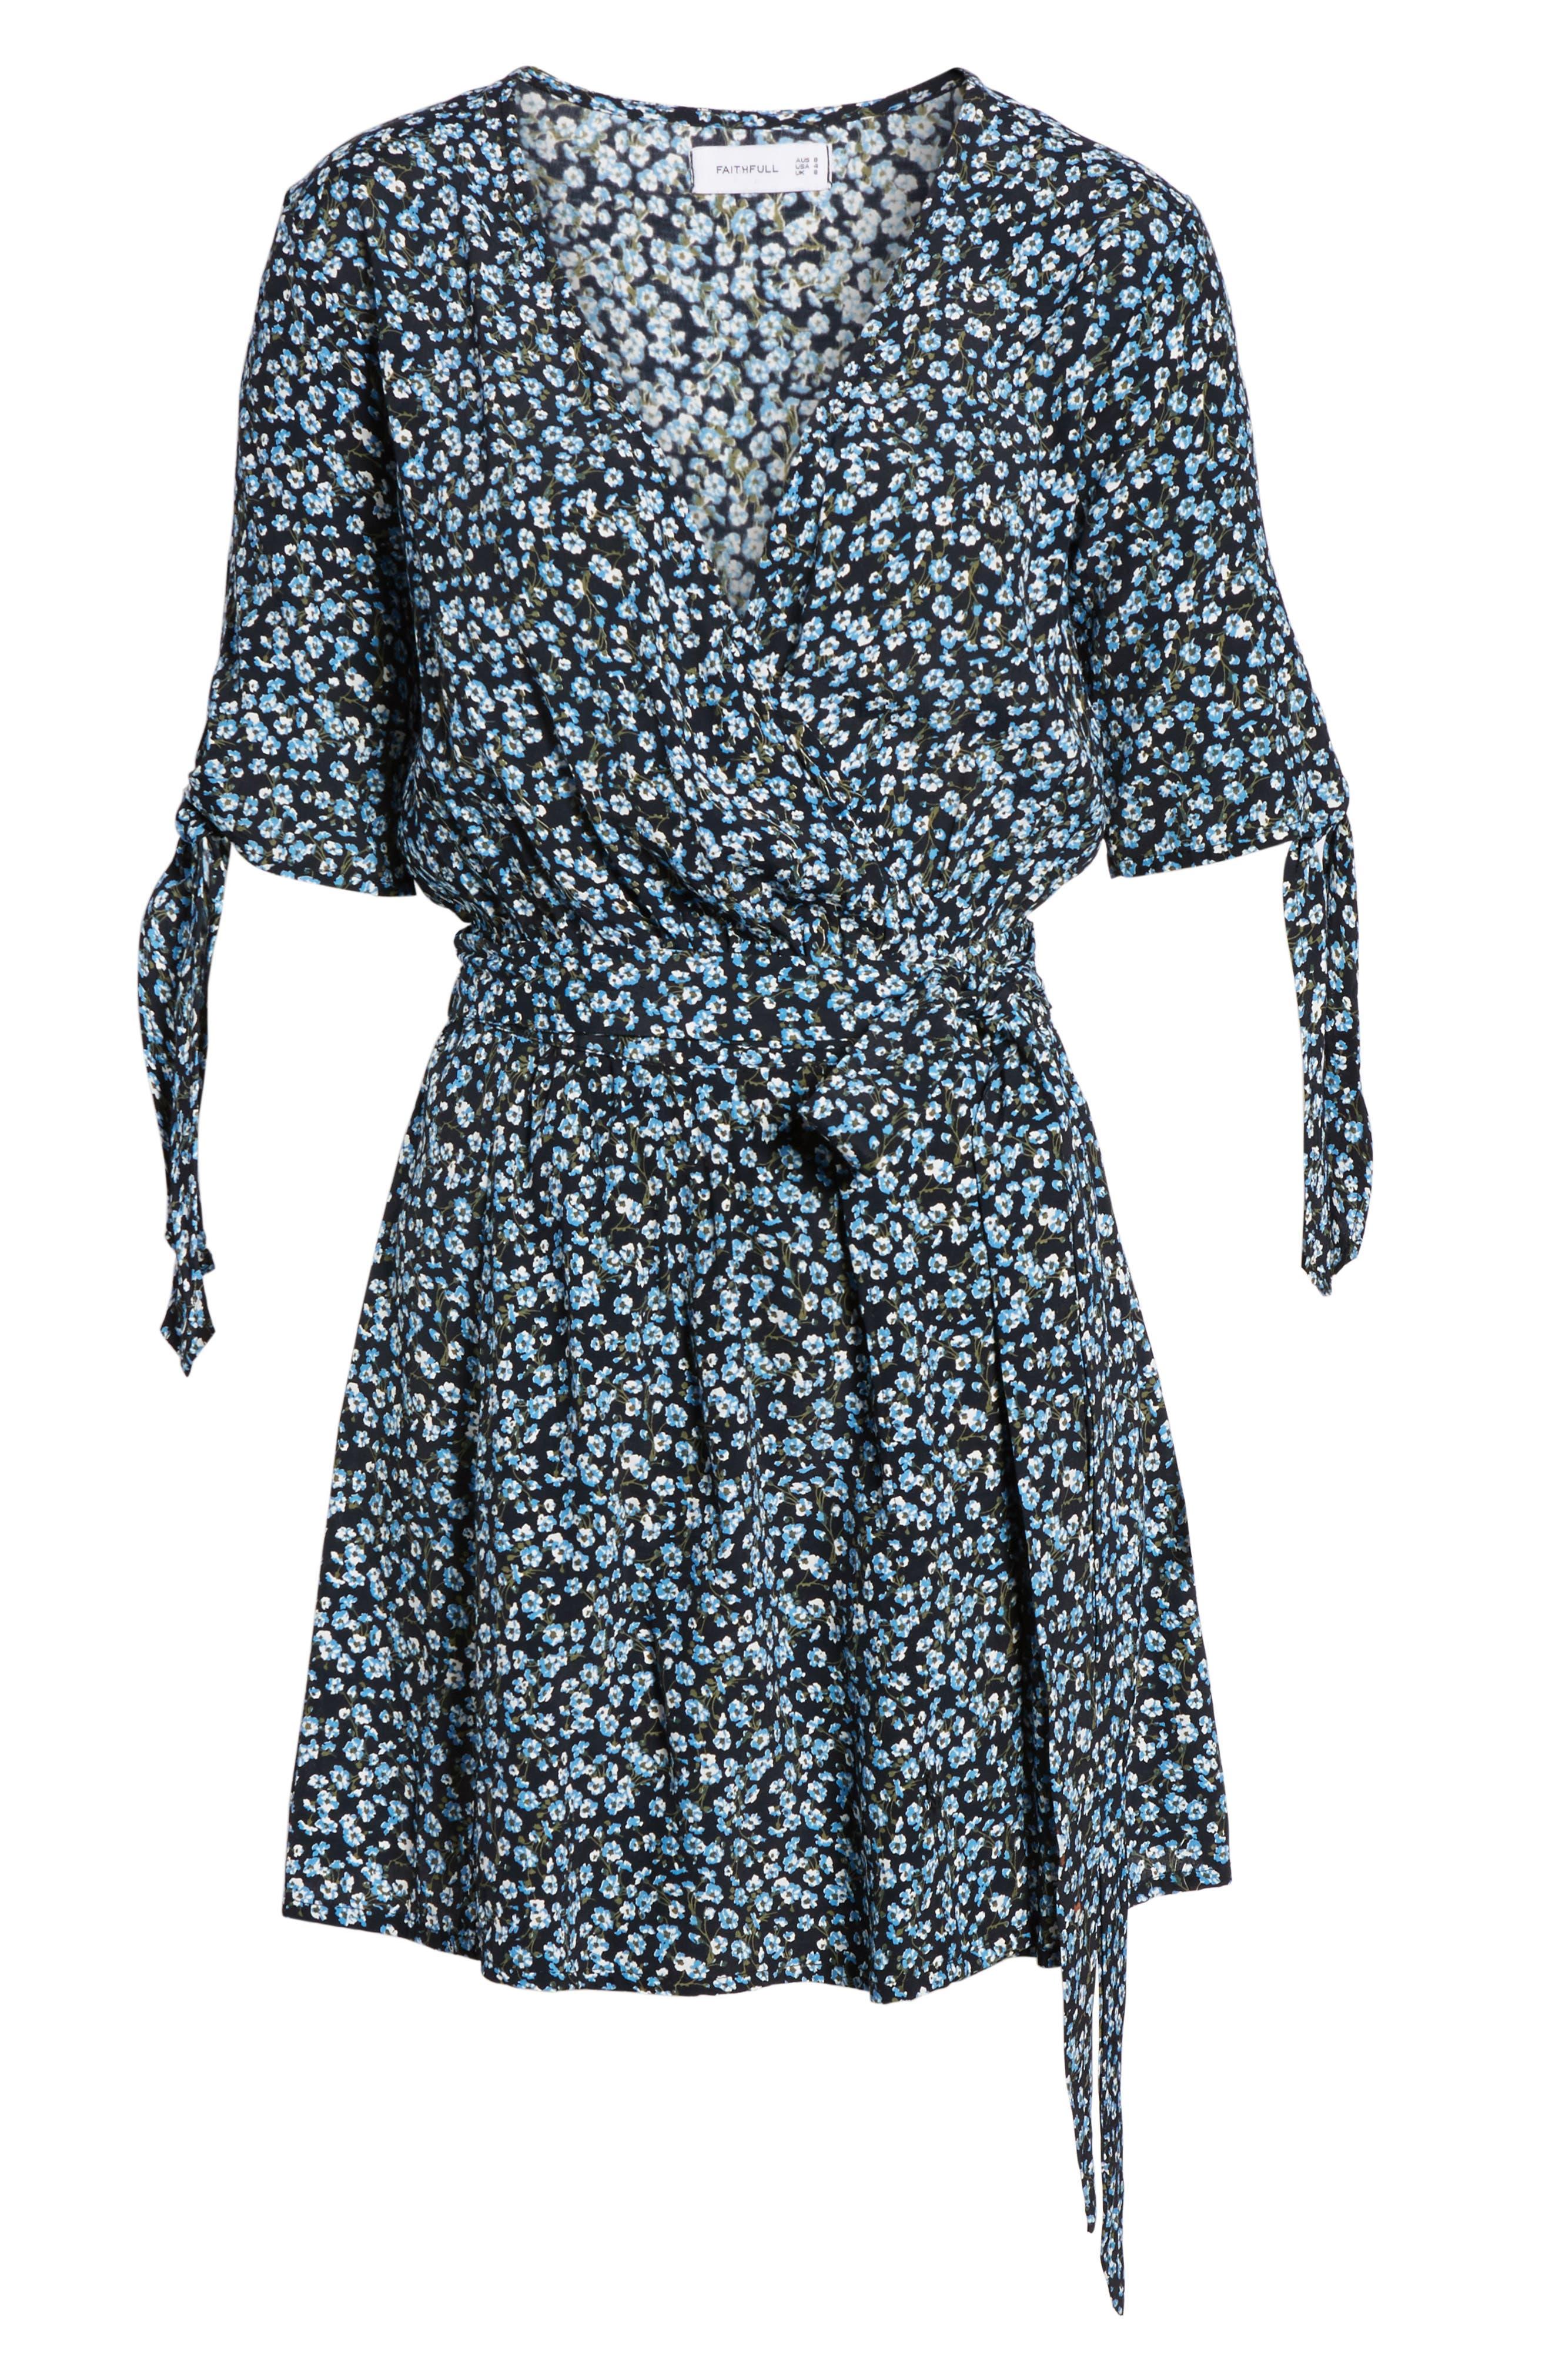 Oslo Floral Wrap Dress,                             Alternate thumbnail 6, color,                             Blossom Village Print - Blue